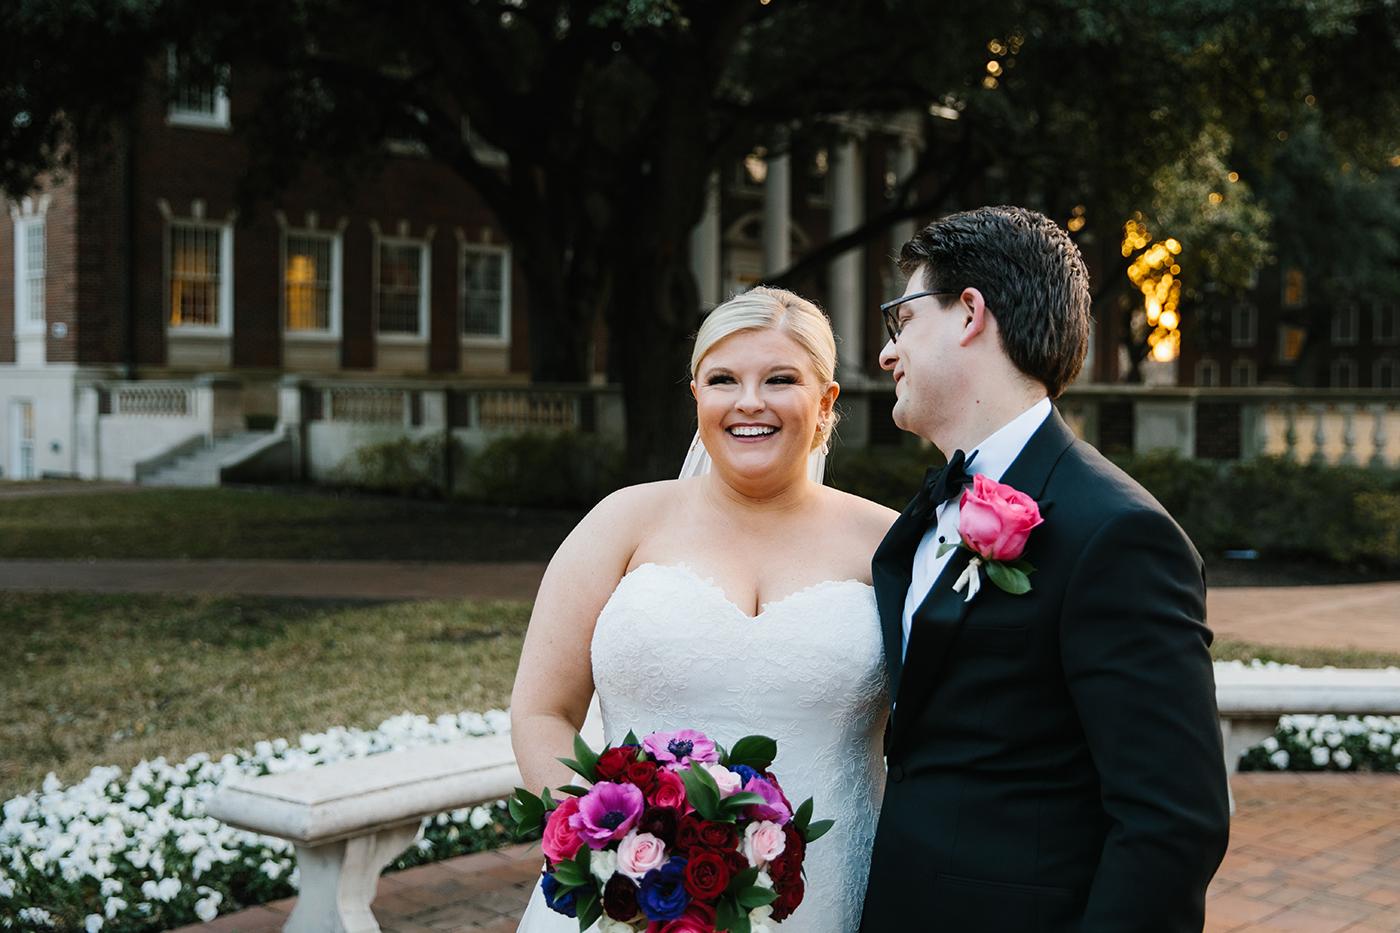 Dallas Weddings Planner - Allday Events - Katie + Matthew at The Adolphus Hotel - 469.jpg